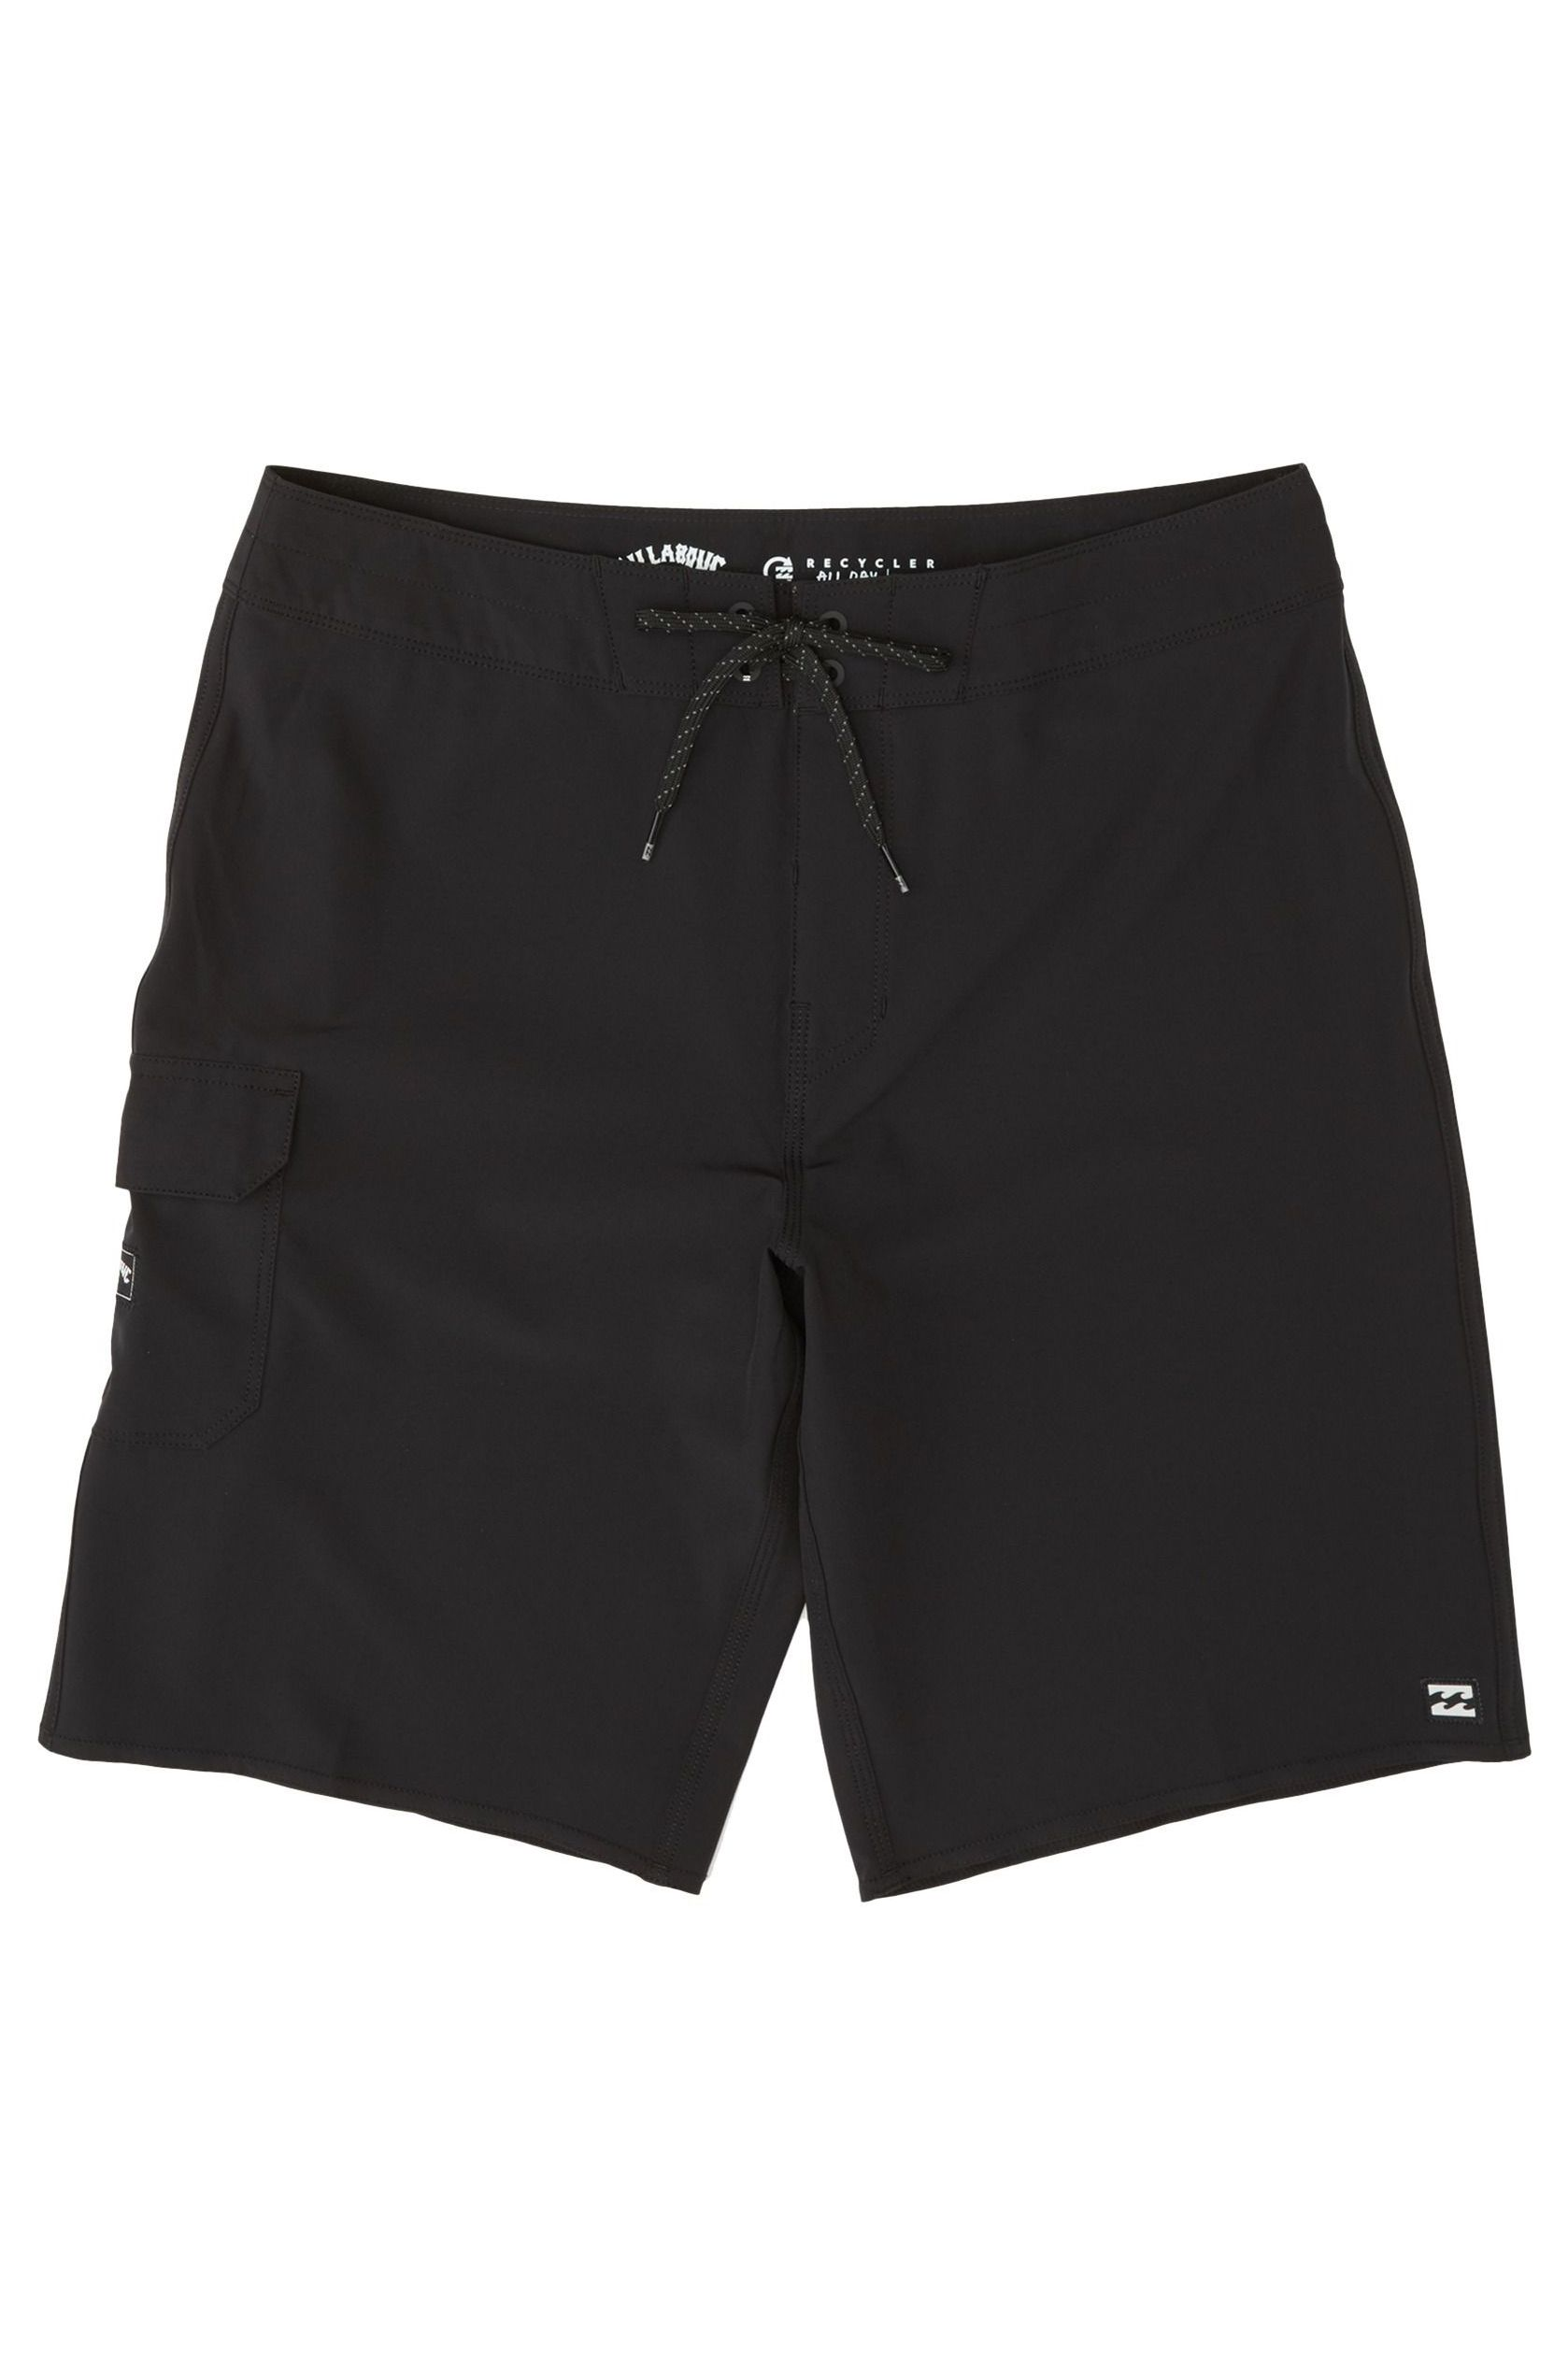 Boardshorts Billabong ALL DAY PRO Black